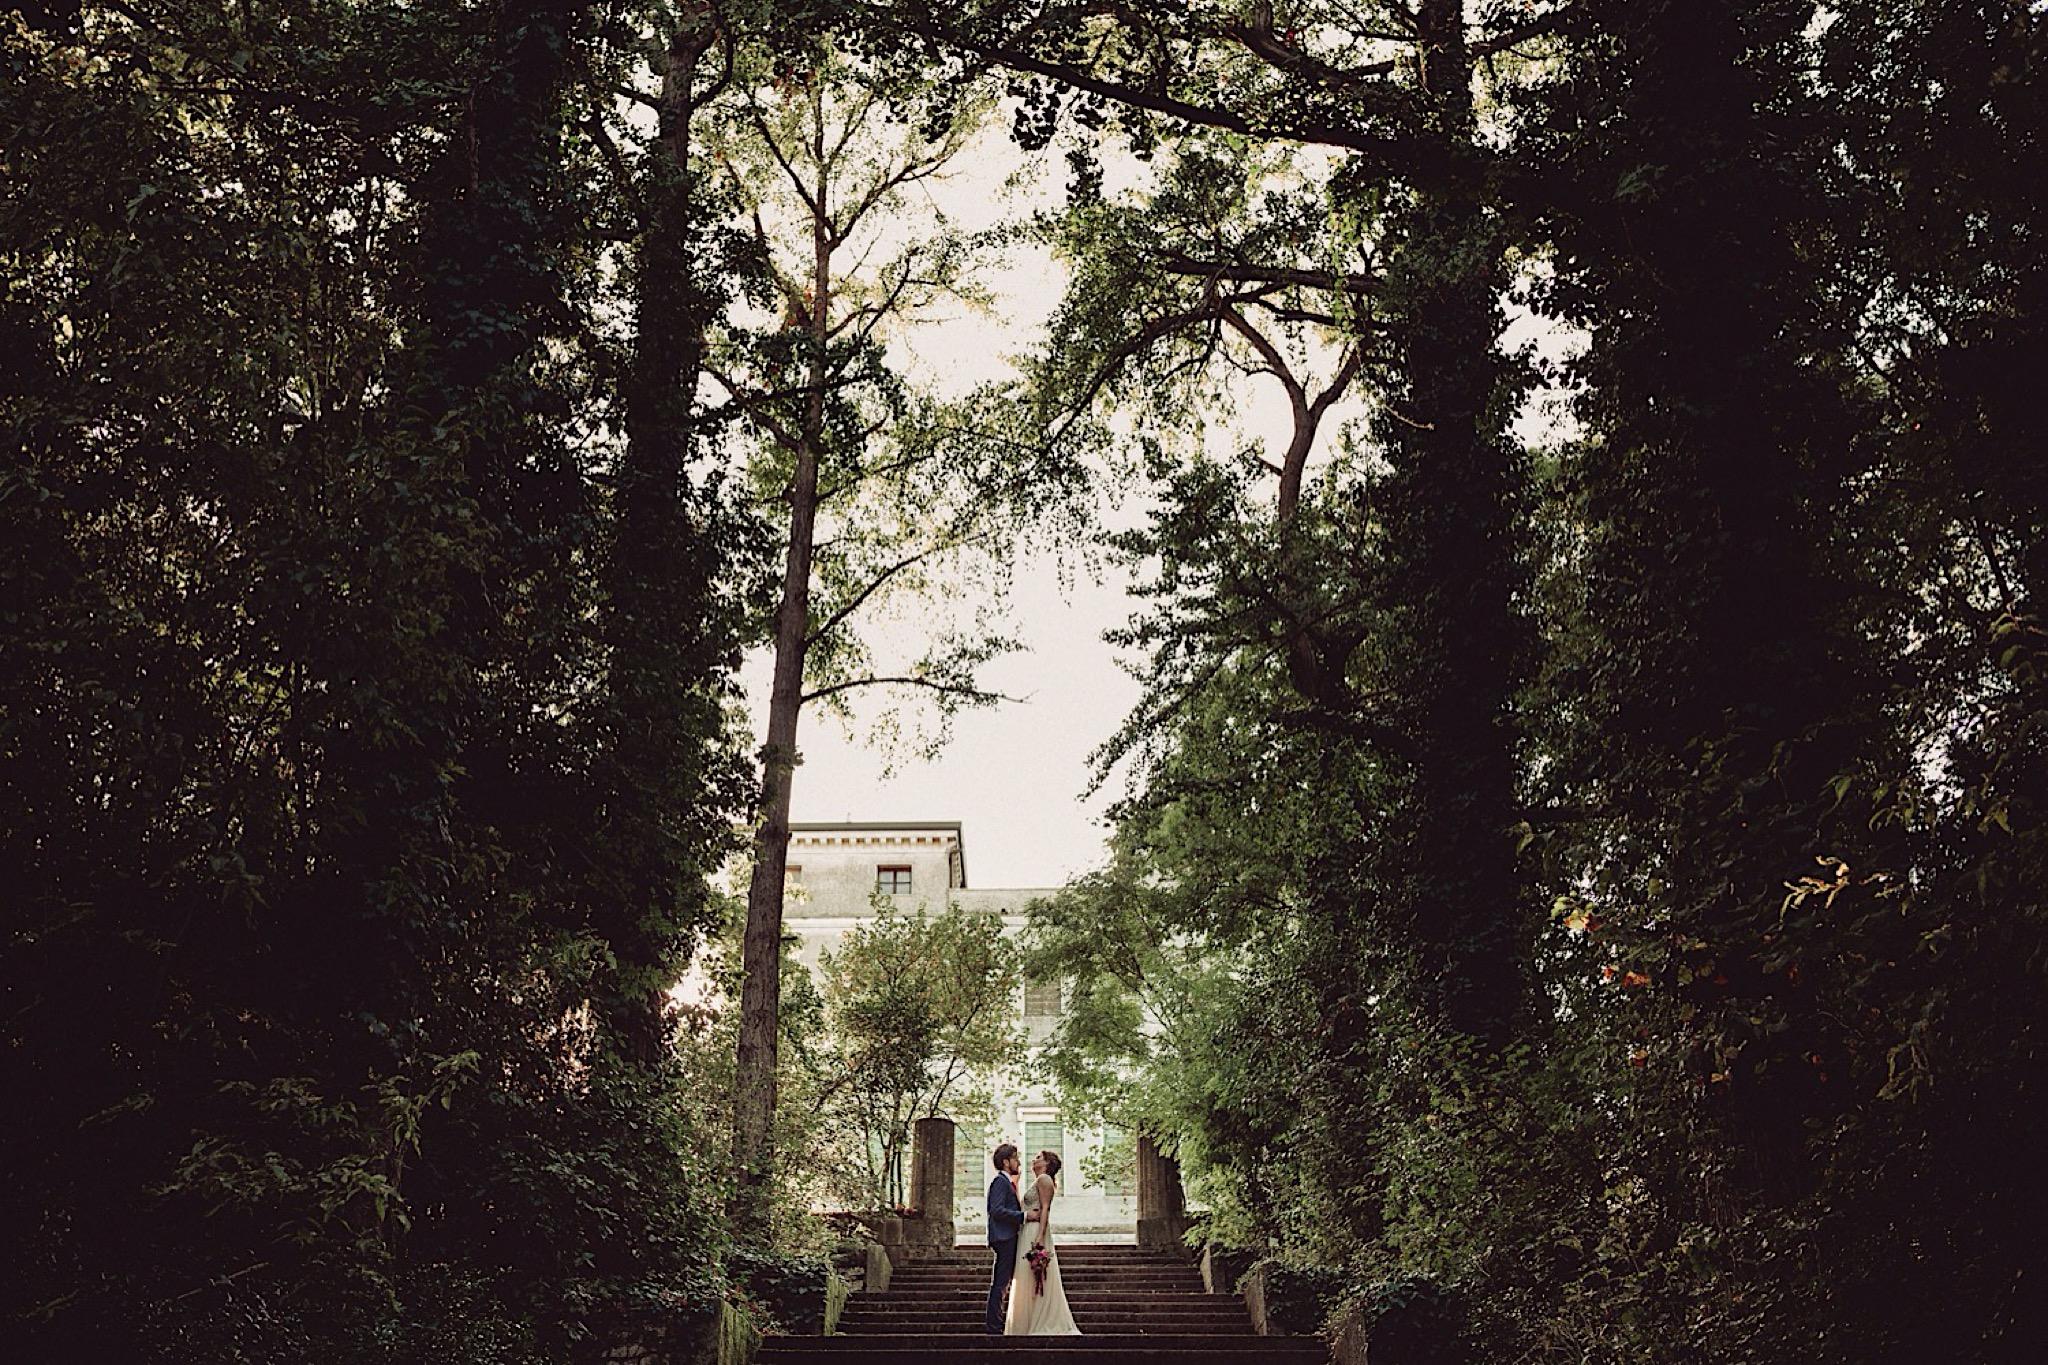 fotografo-matrimonio-villa-papafava-frassanelle-55